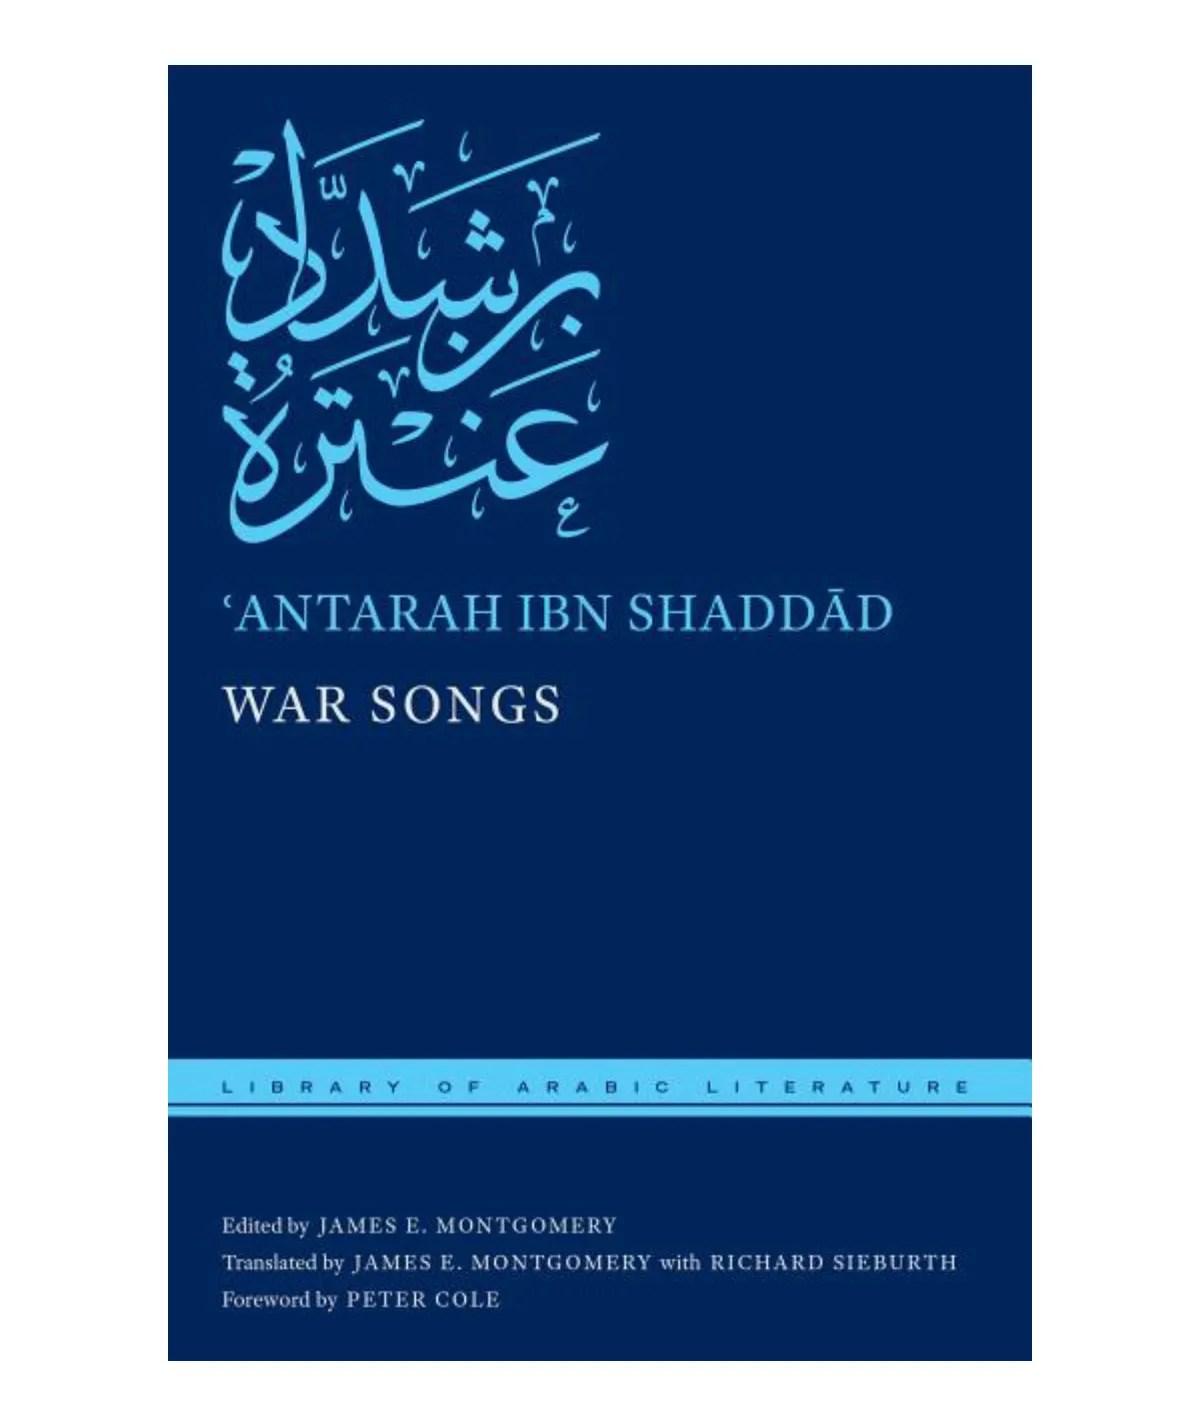 War Songs  ( Library of Arabic Literature  #11  ): Shaddād, ʿantarah Ibn   Montgomery, James E   Sieburth, Richard   Cole, Peter